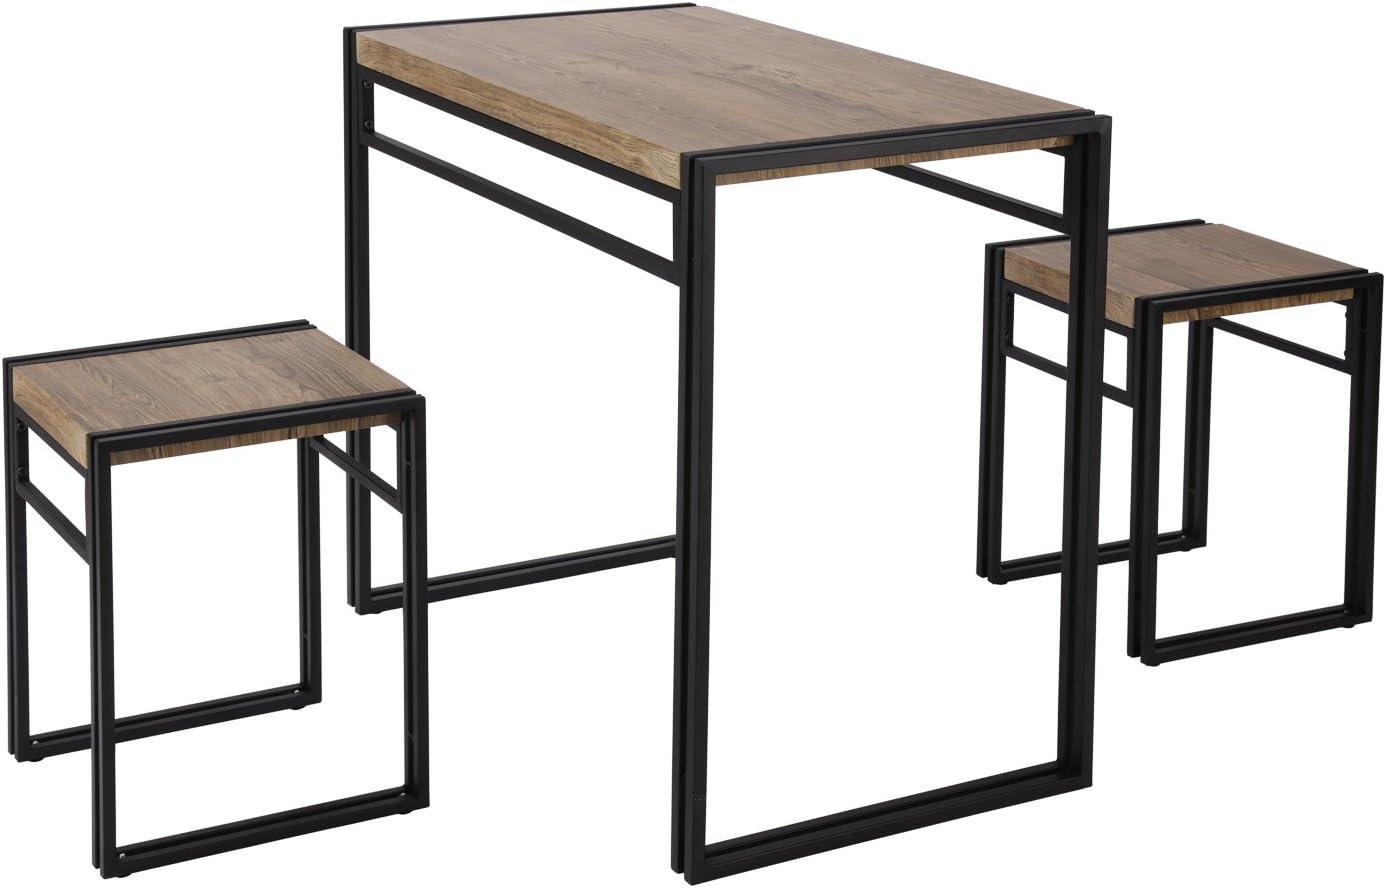 FIVEGIVEN 3 Piece Dining Bistro Table Set Indoor Kitchen Pub Table Set for Small Spaces Sonoma  sc 1 st  Amazon.com & Table u0026 Chair Sets | Amazon.com